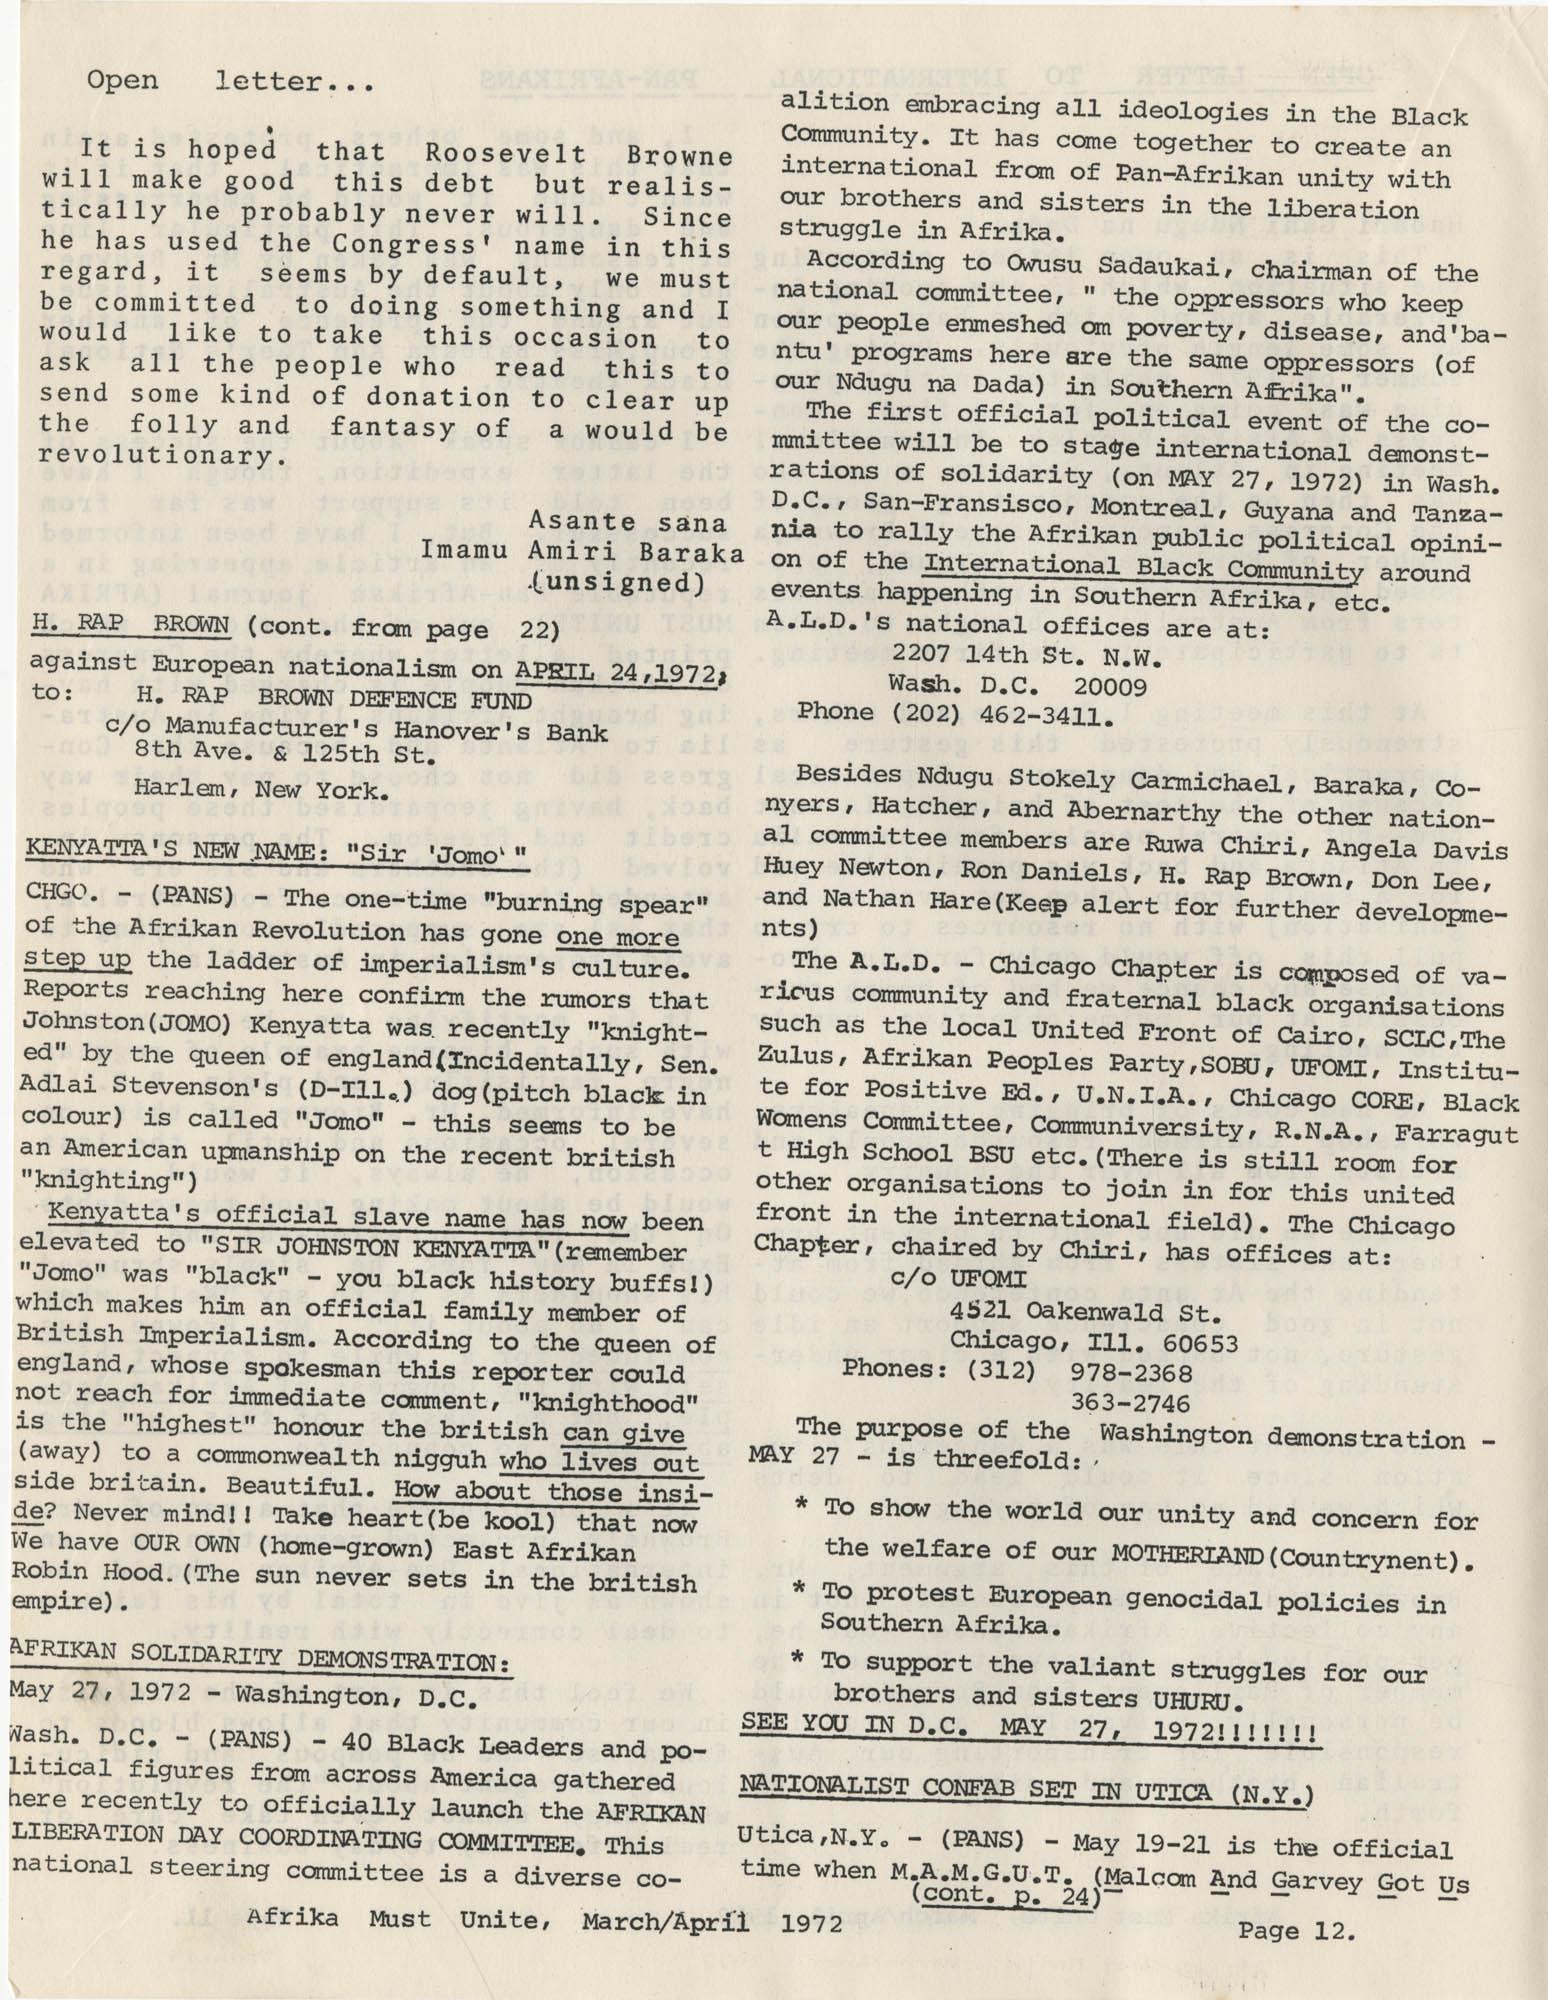 Afrika Must Unite, Vol. 1, No. 4, Page 12